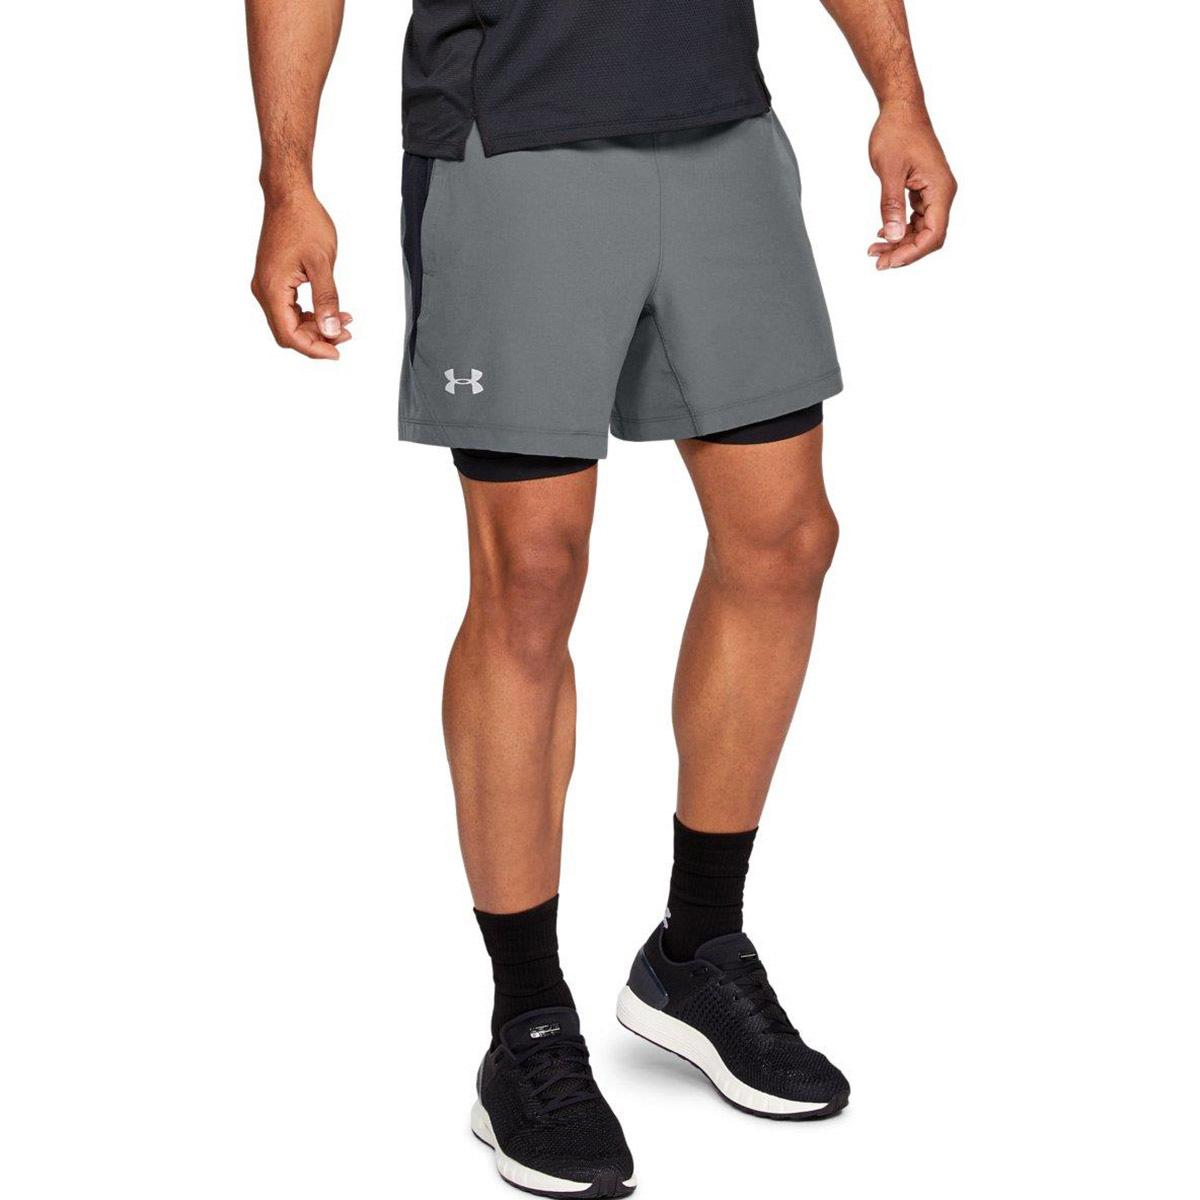 Clothing -  under armour UA Qualifier Speedpocket 2in1 Shorts 6601